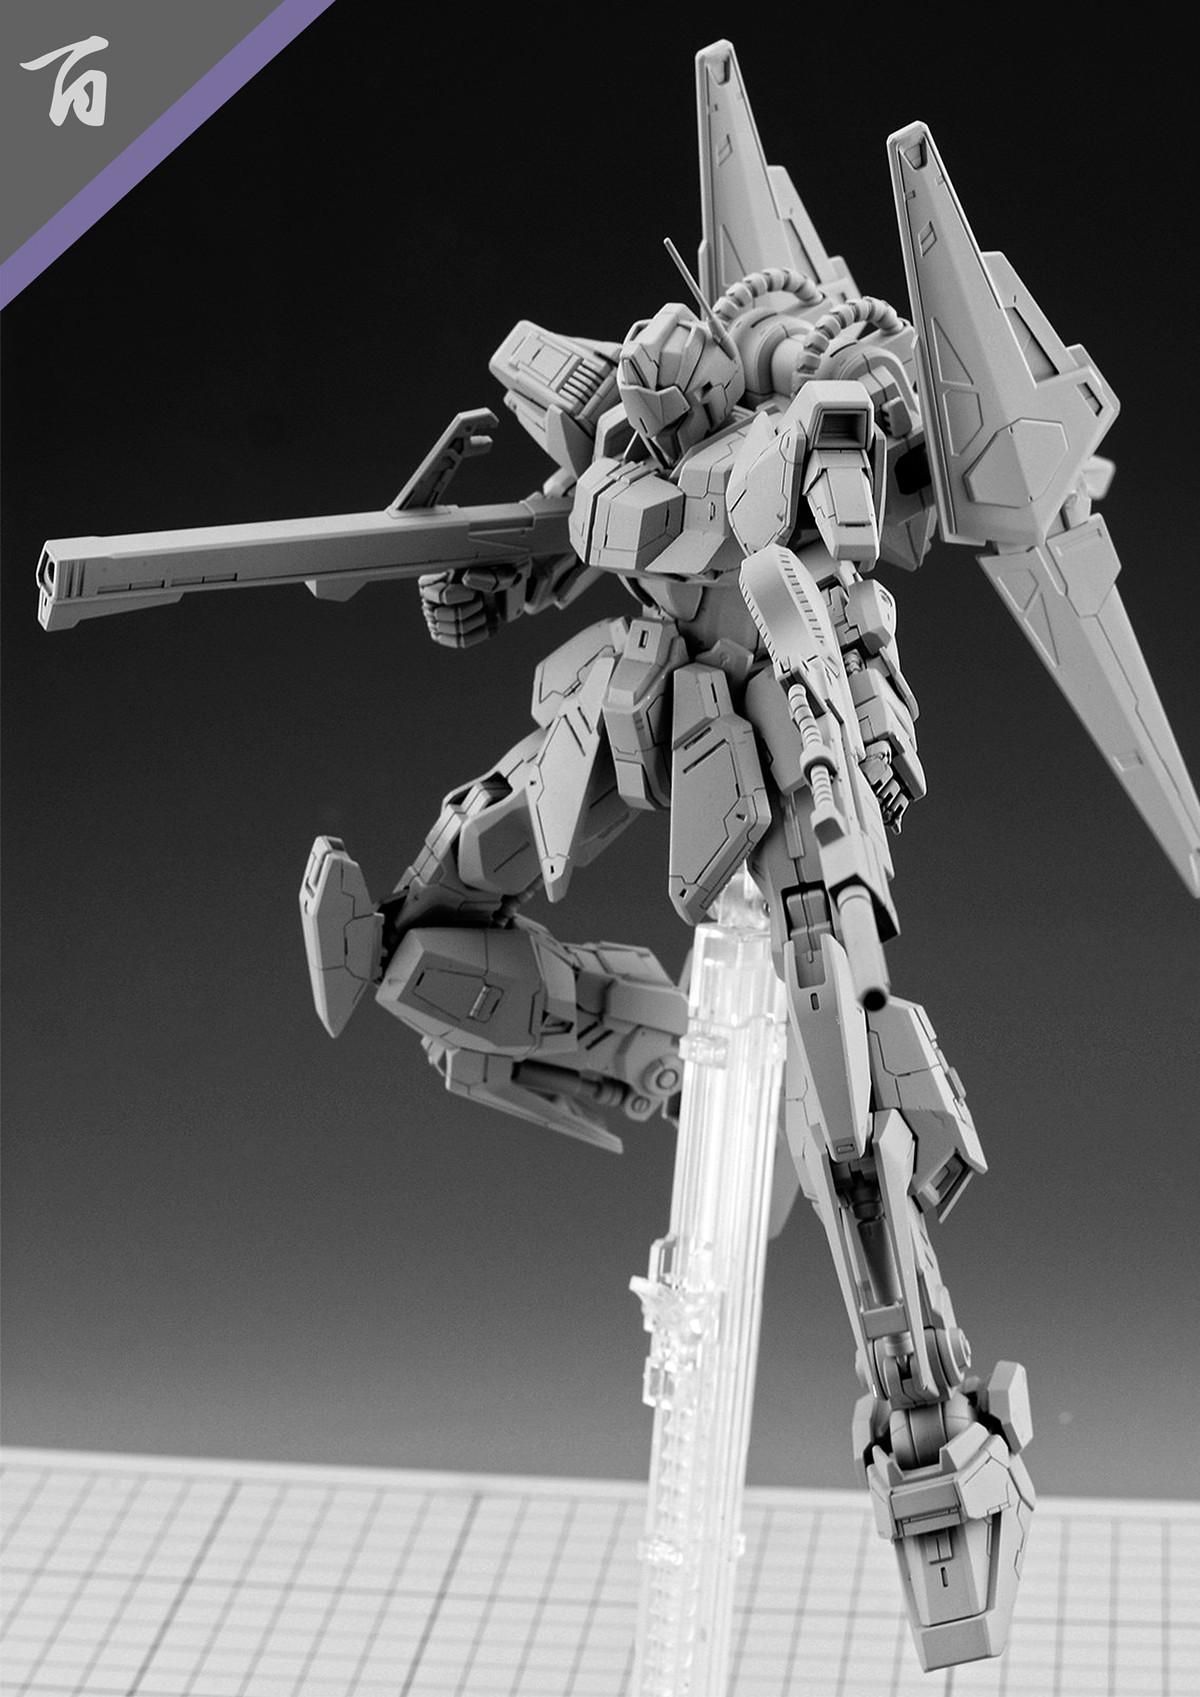 G120_hyakusiki_info_019.jpg